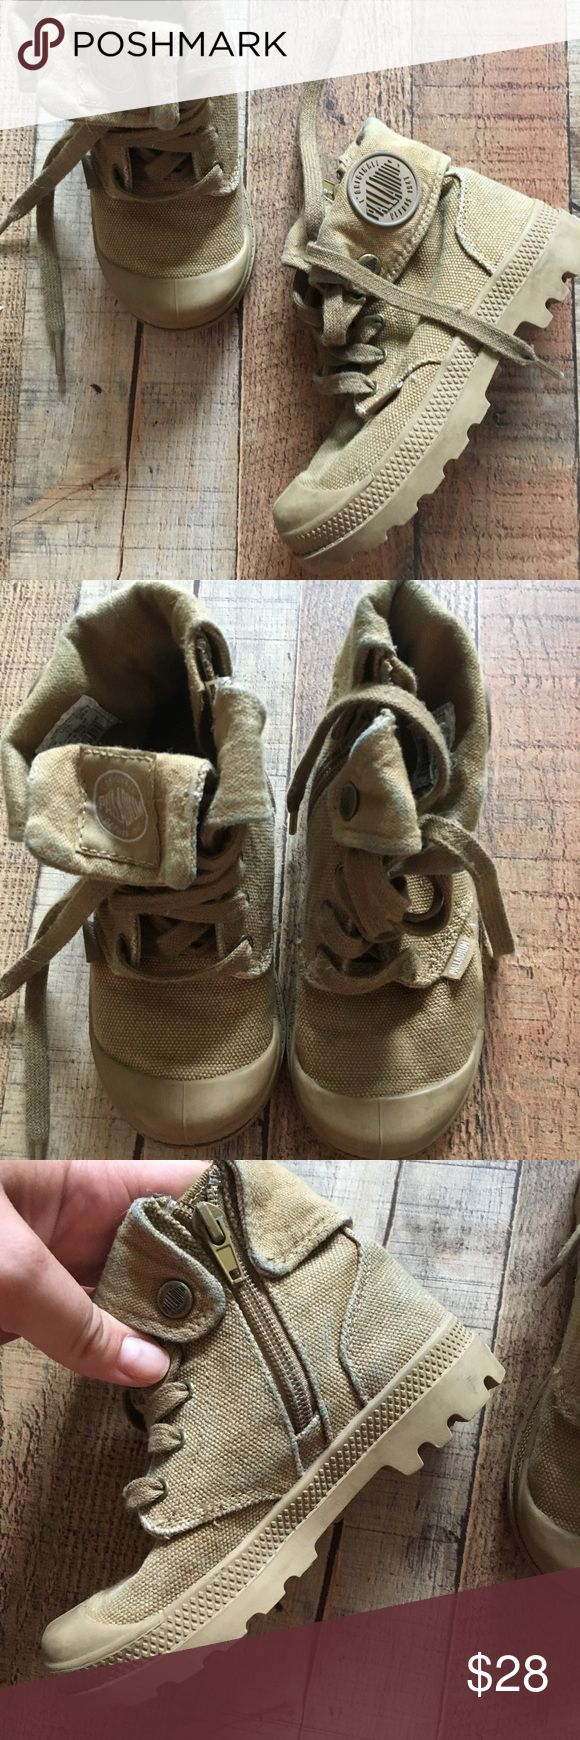 Kids palladium boots Kids desert folded canvas boots Palladium Shoes Boots